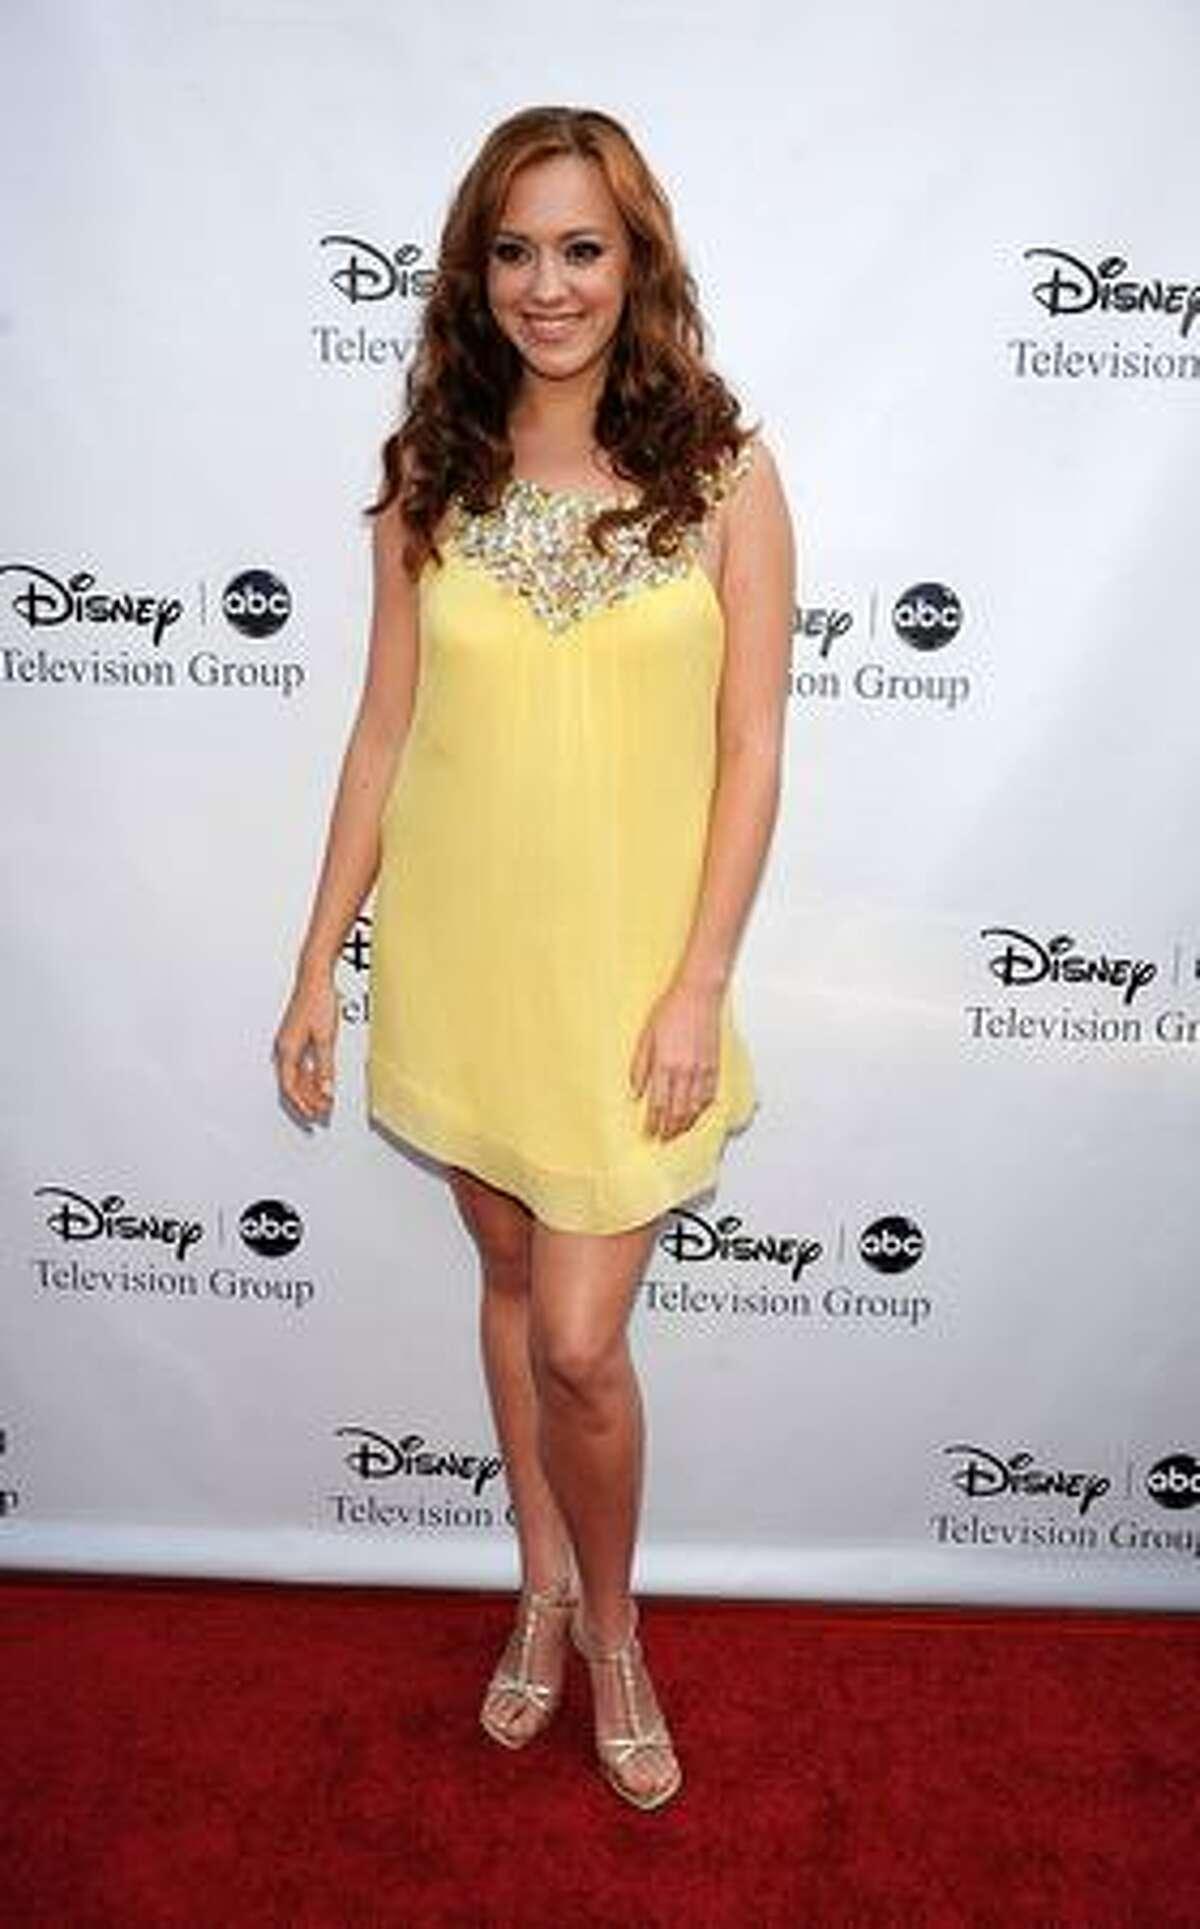 Actress Andrea Bowen arrives at Disney-ABC Television Group Summer Press Tour Party at The Langham Hotel in Pasadena, California.